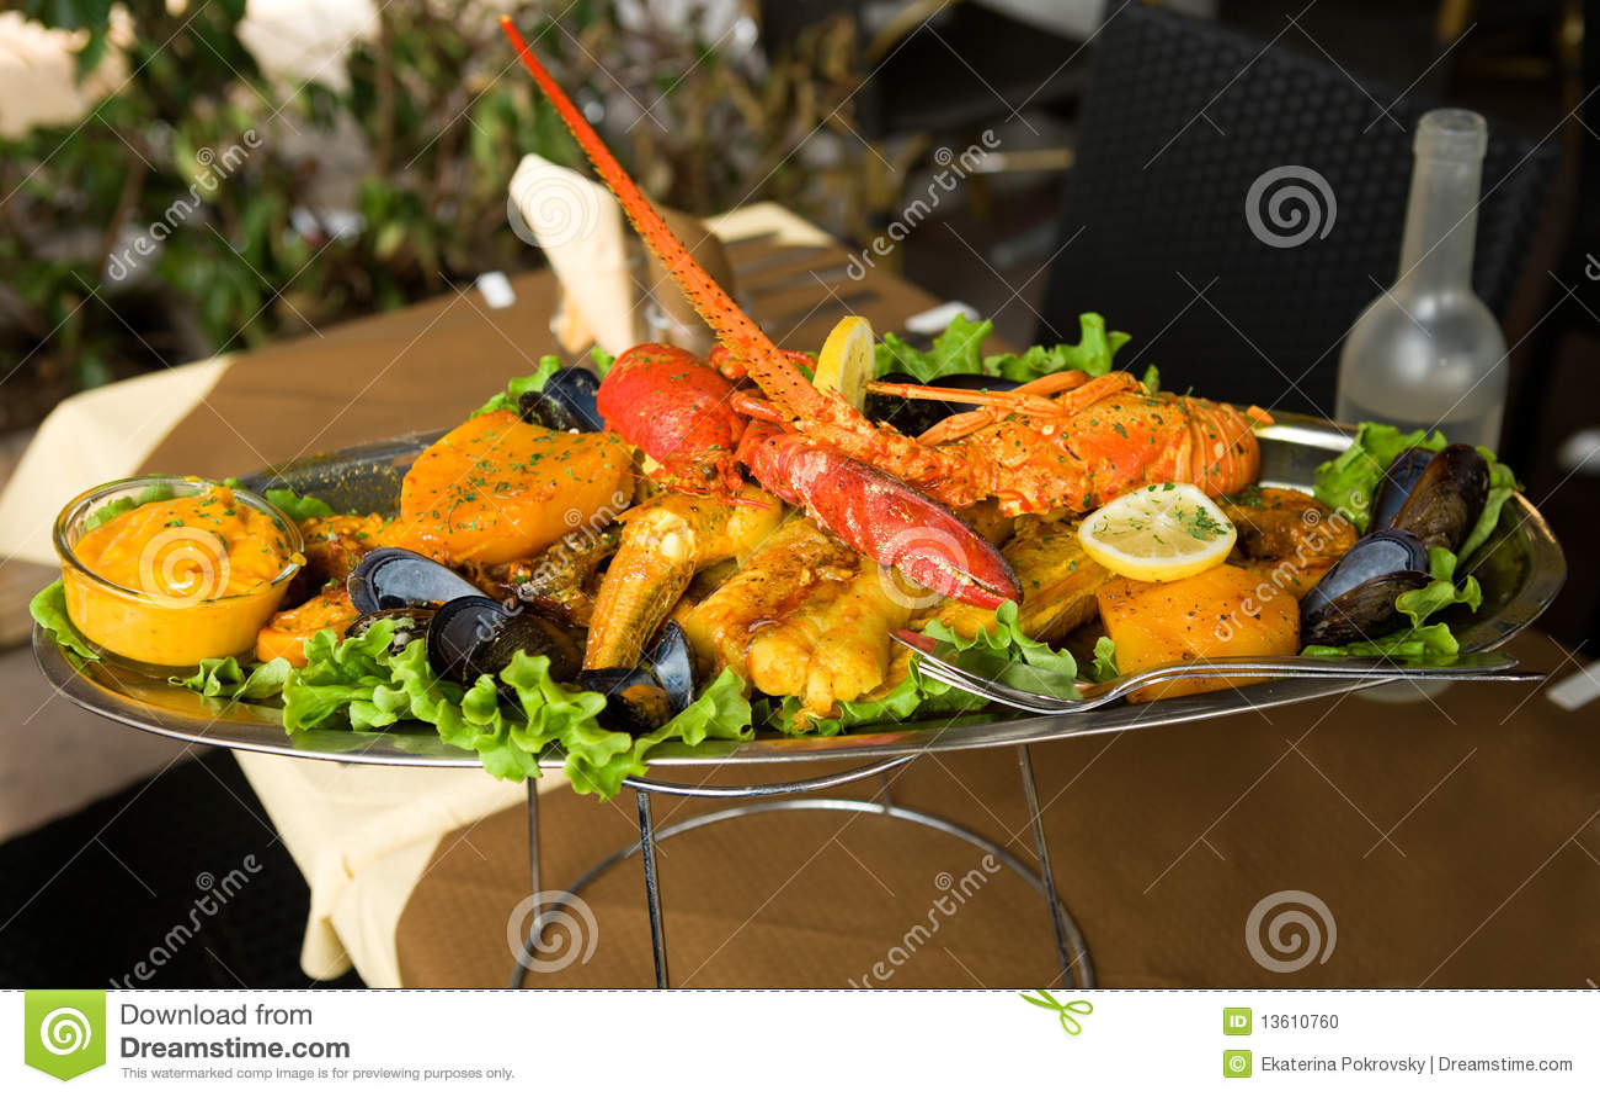 Traditional Provencal fish stew bouillabaisse